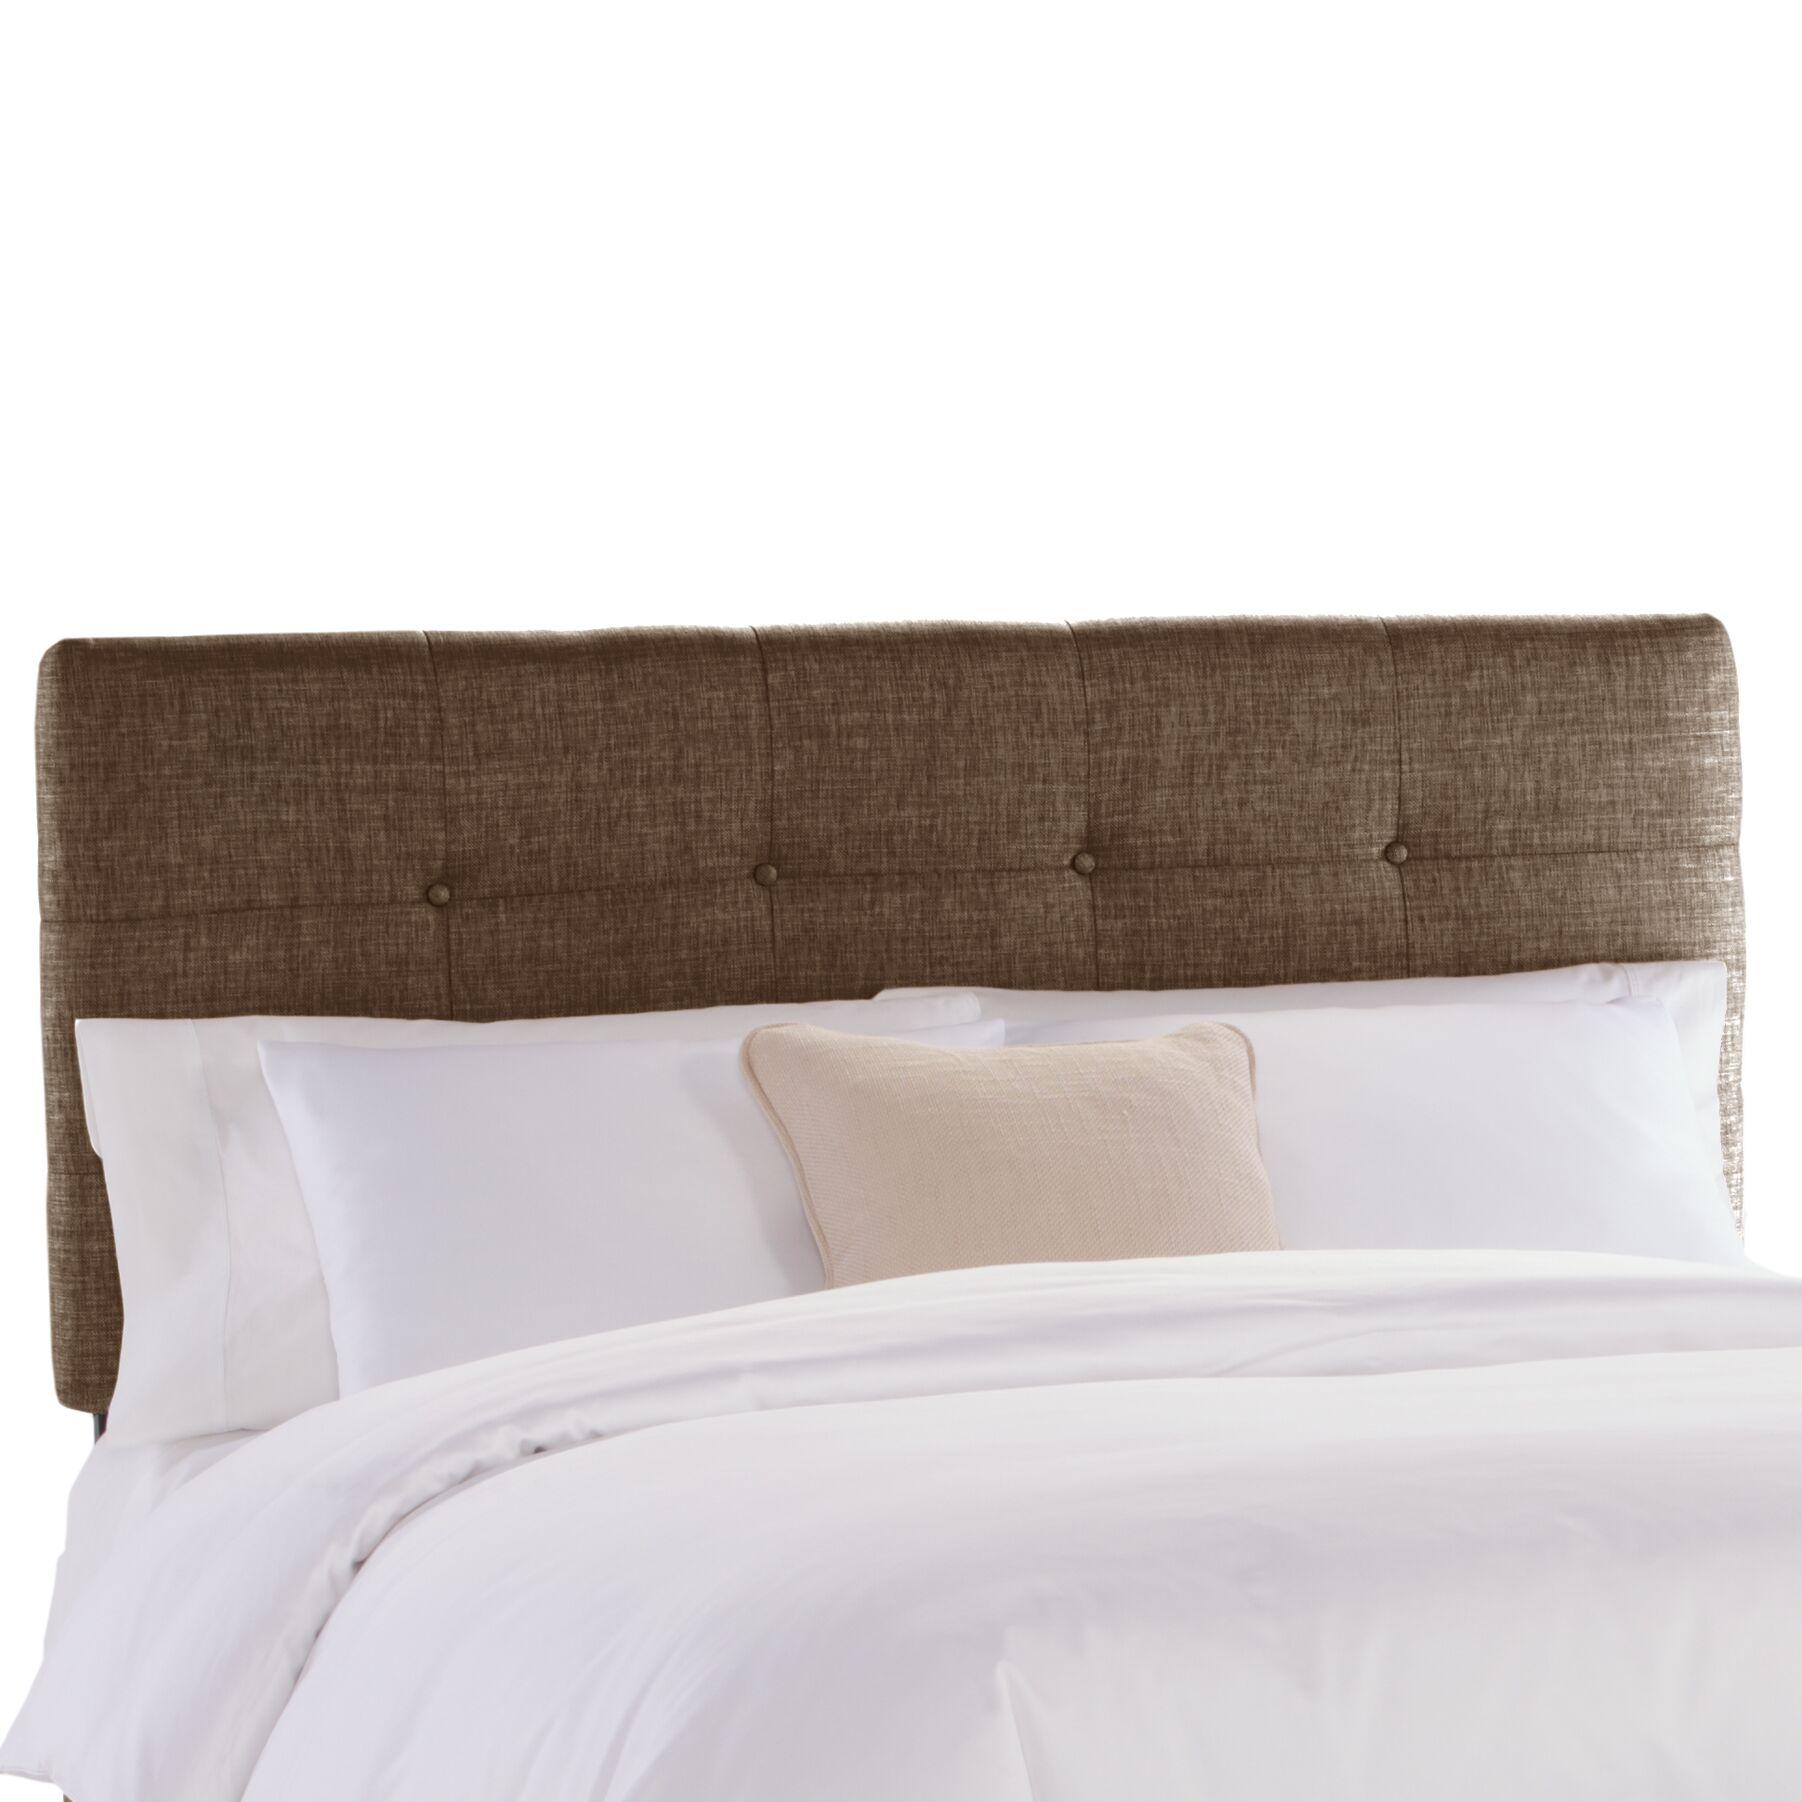 Tufted Upholstered Panel Headboard Size: King, Upholstery: Groupie Praline